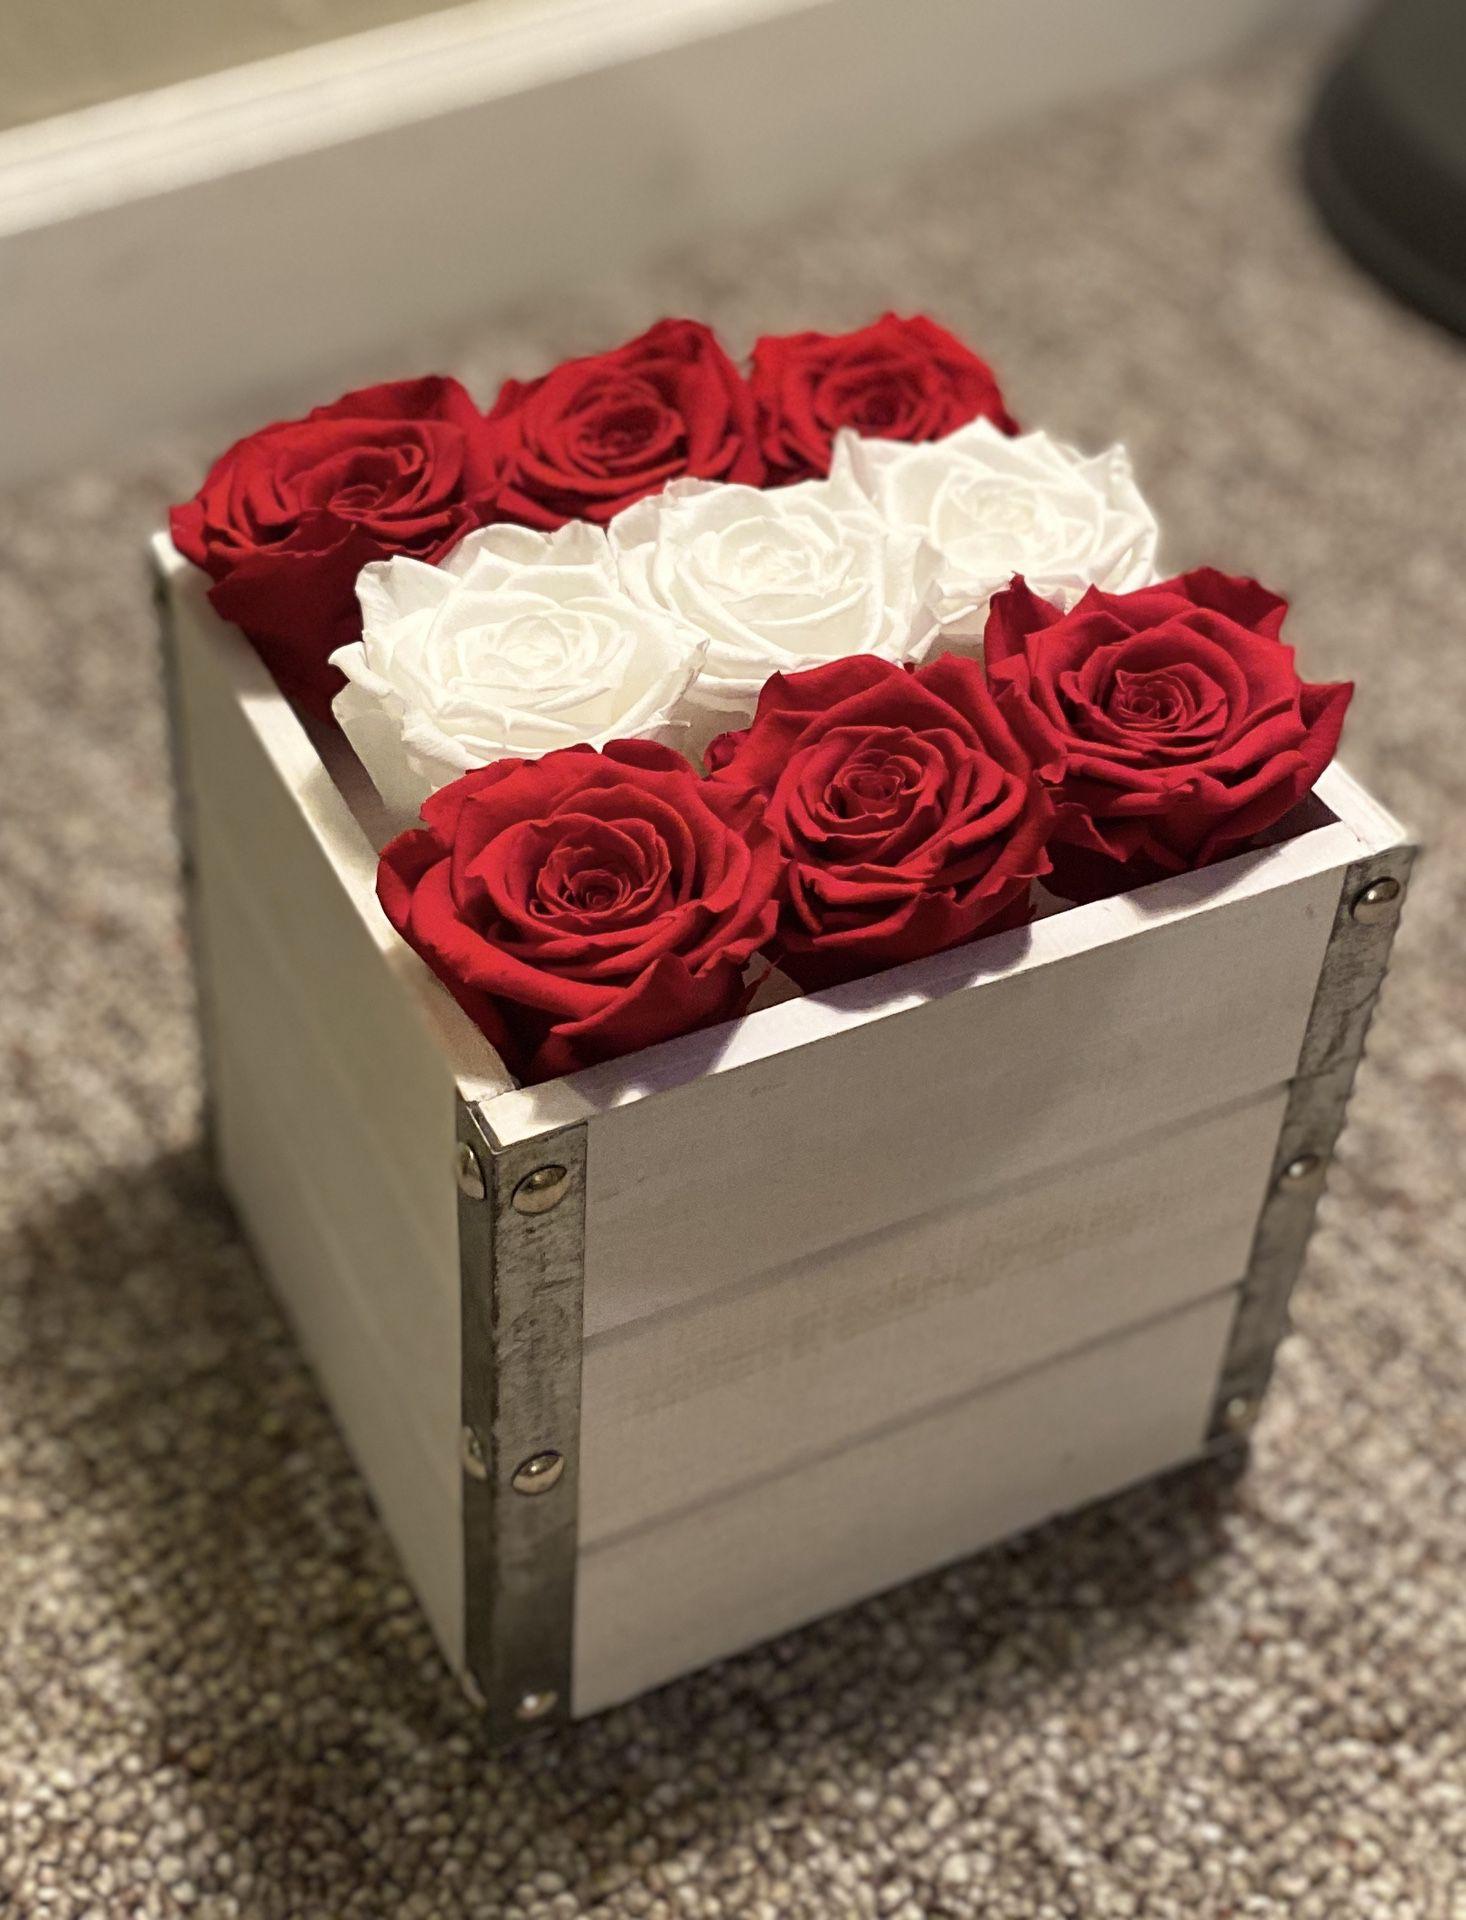 Roses preserved